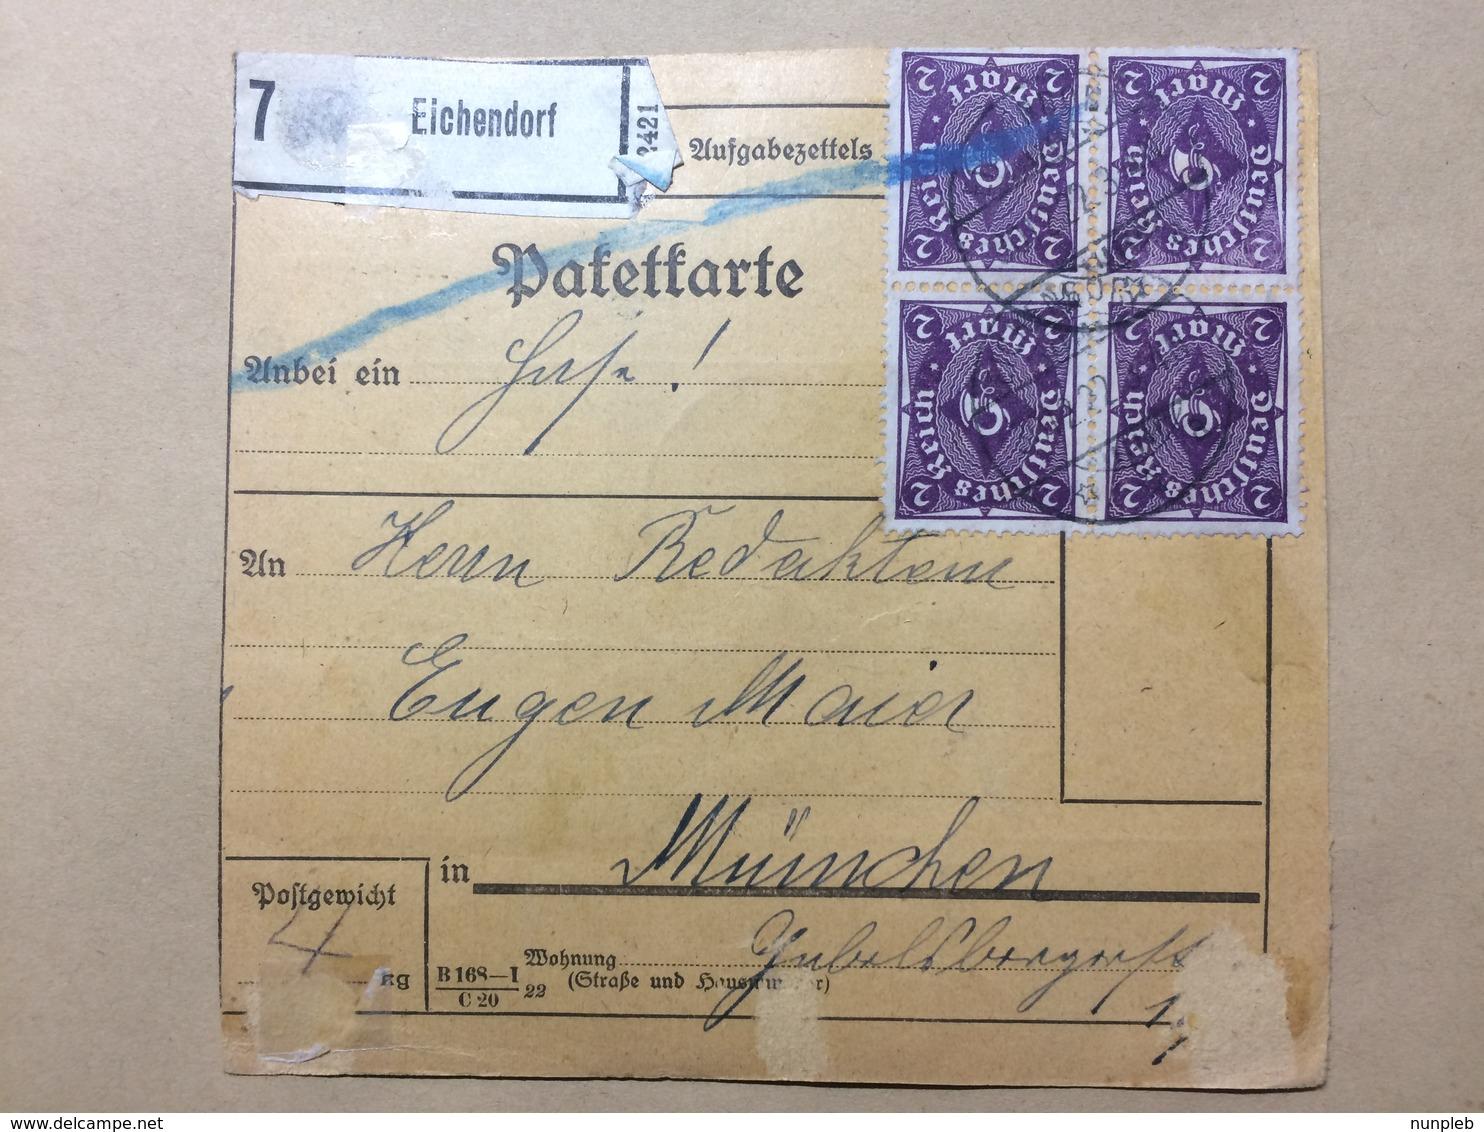 GERMANY - 1922 Bulletin D`expedition - Eichendorf To Munchen Munich - Multi-stamped Both Sides - Allemagne